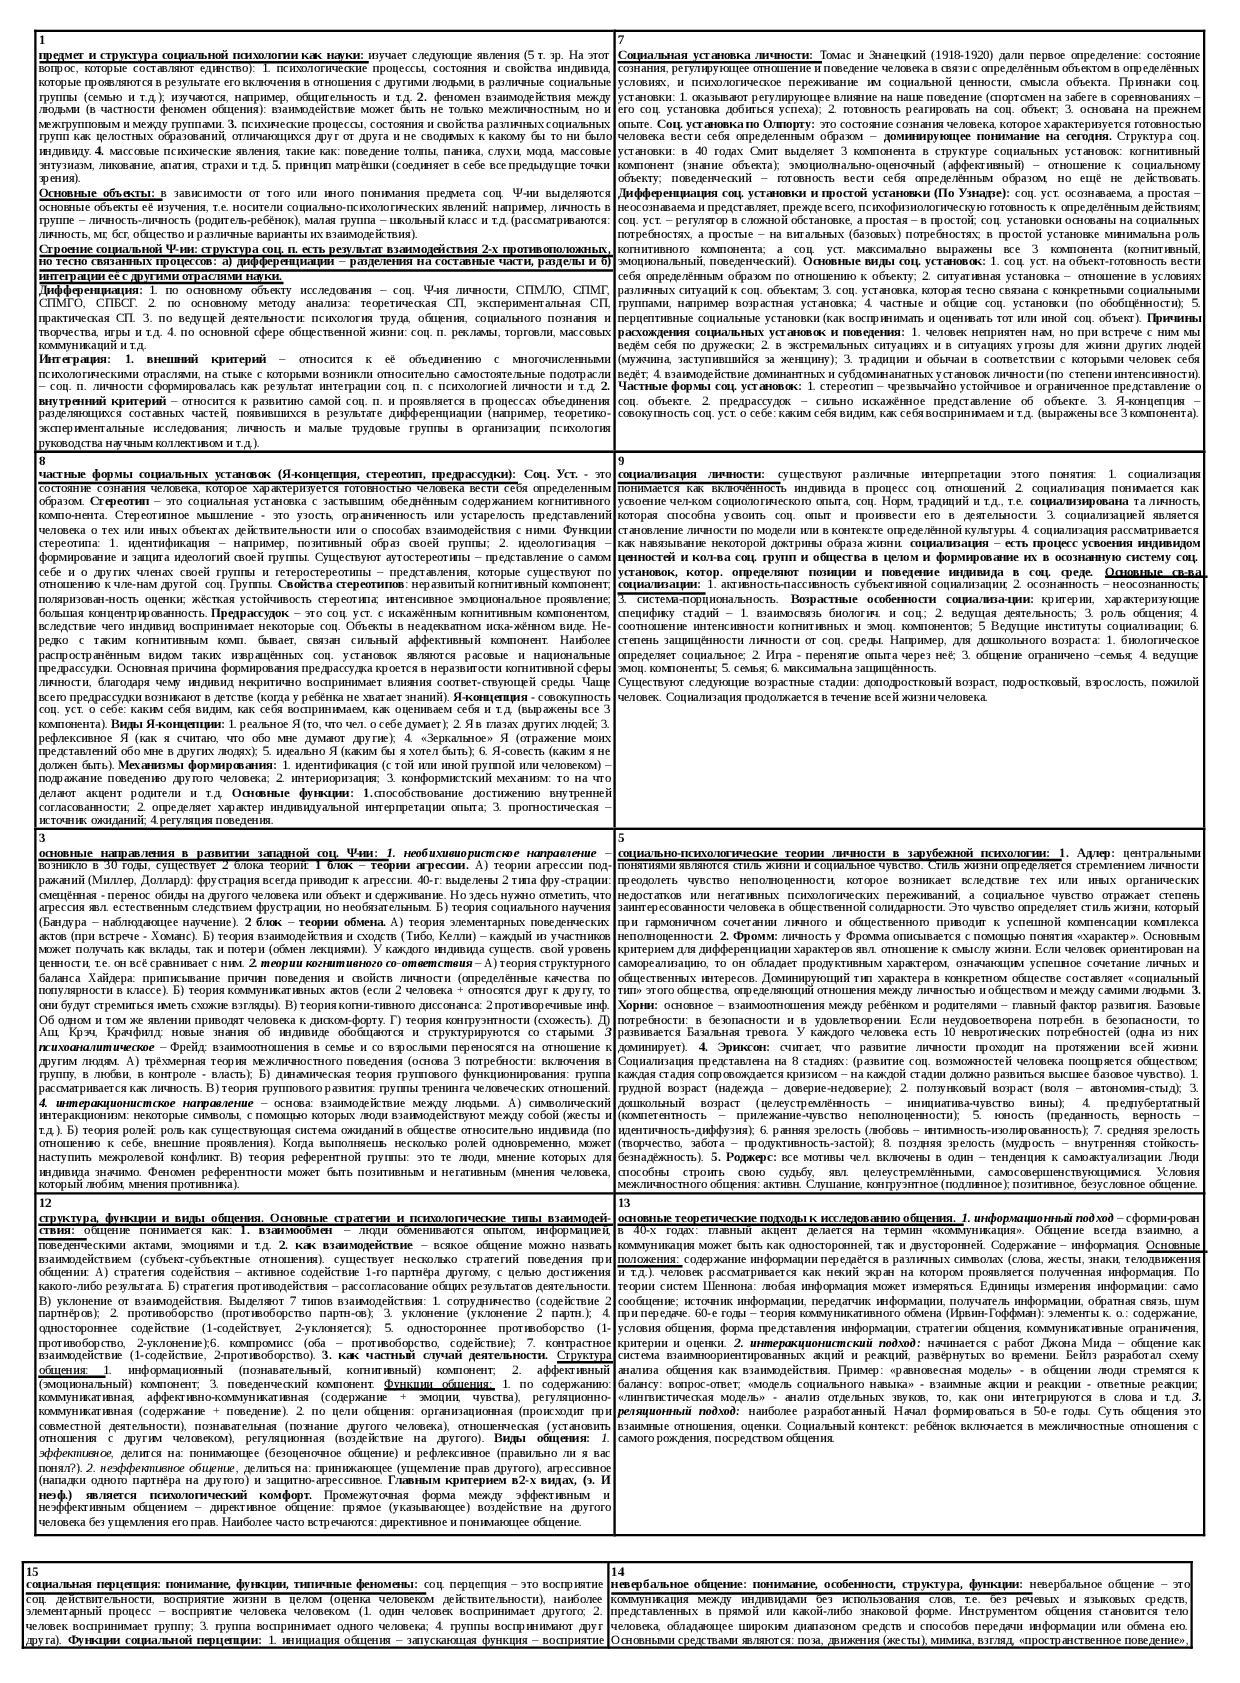 Внимание — википедия с видео // wiki 2